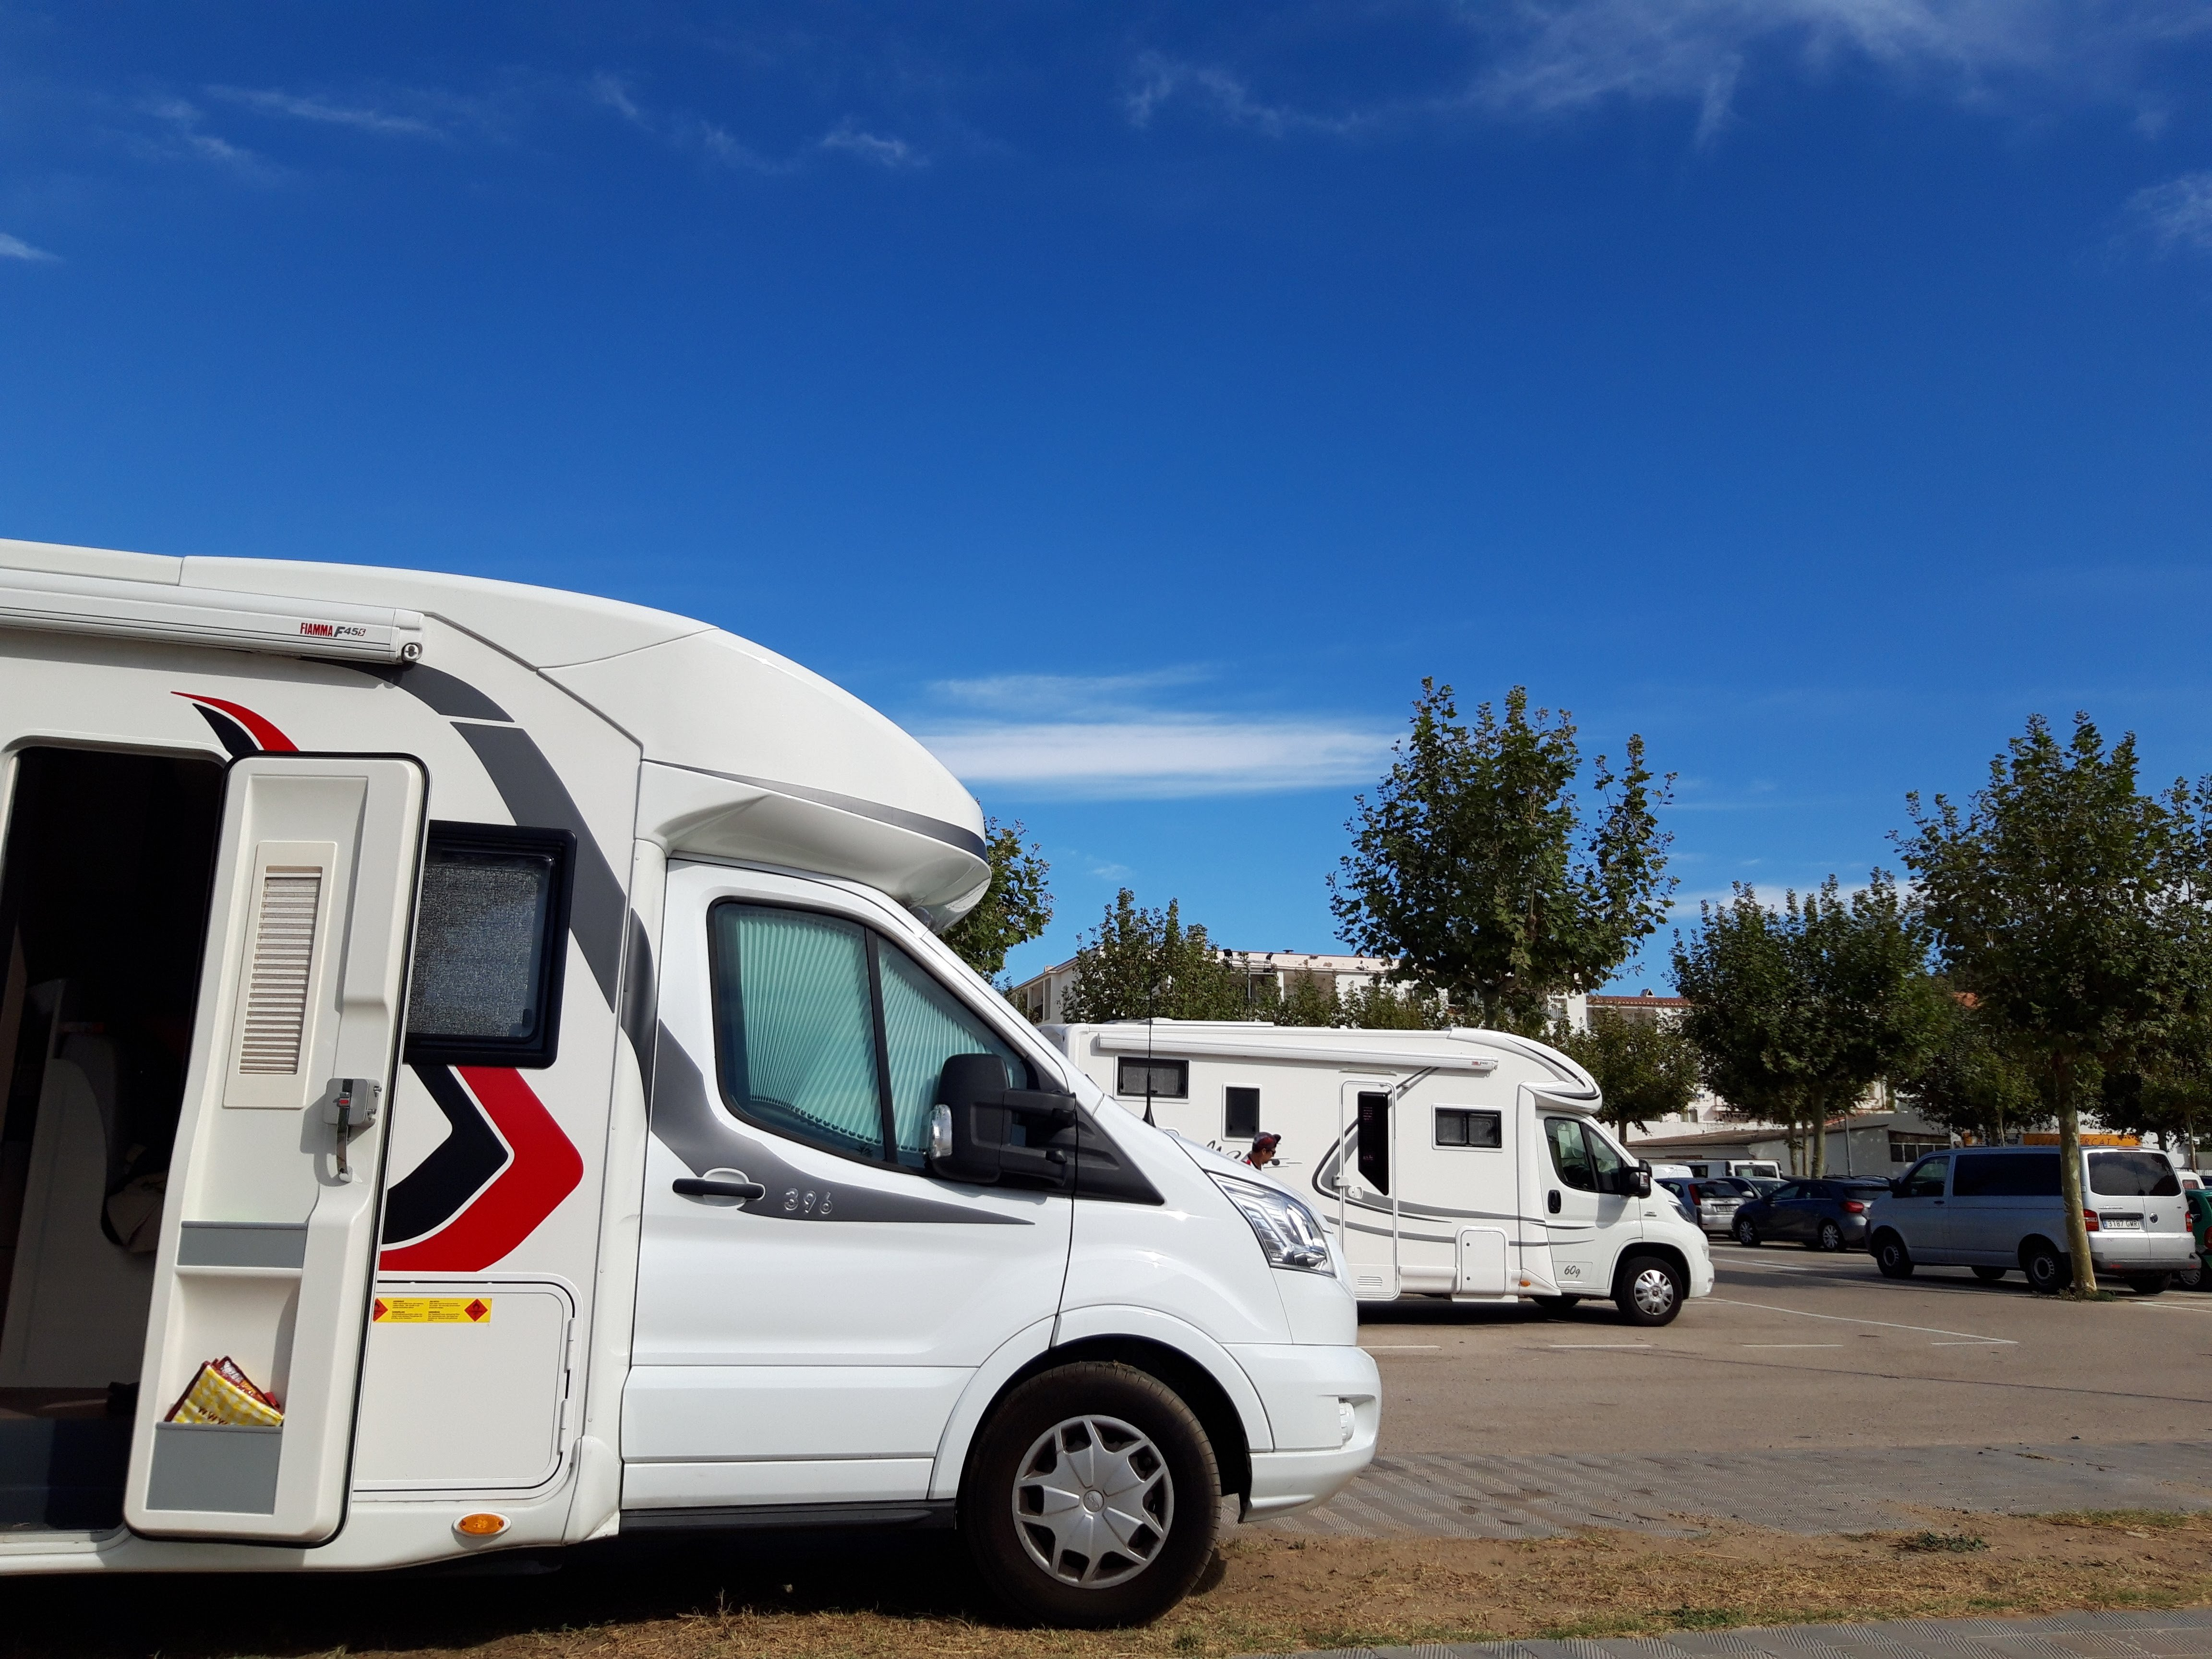 Comment tester ou commencer à voyager en camping-car ou en camping-car